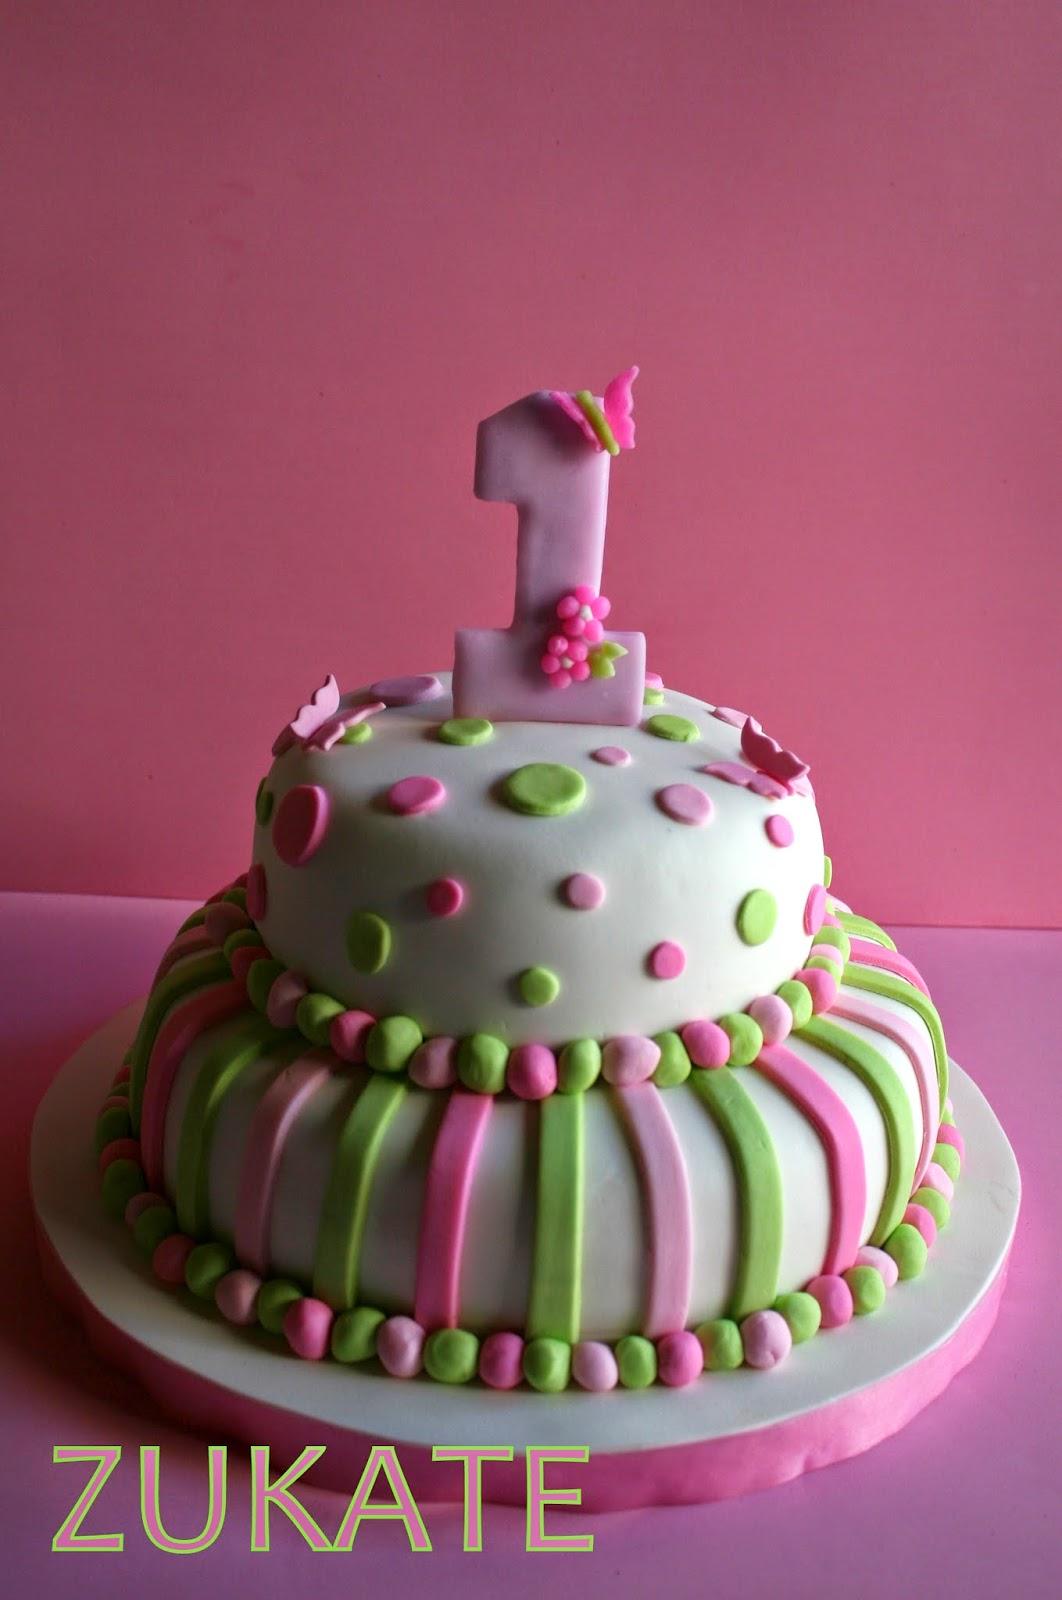 Tortas para bautismo y primer a o zukate for Tortas decoradas sencillas